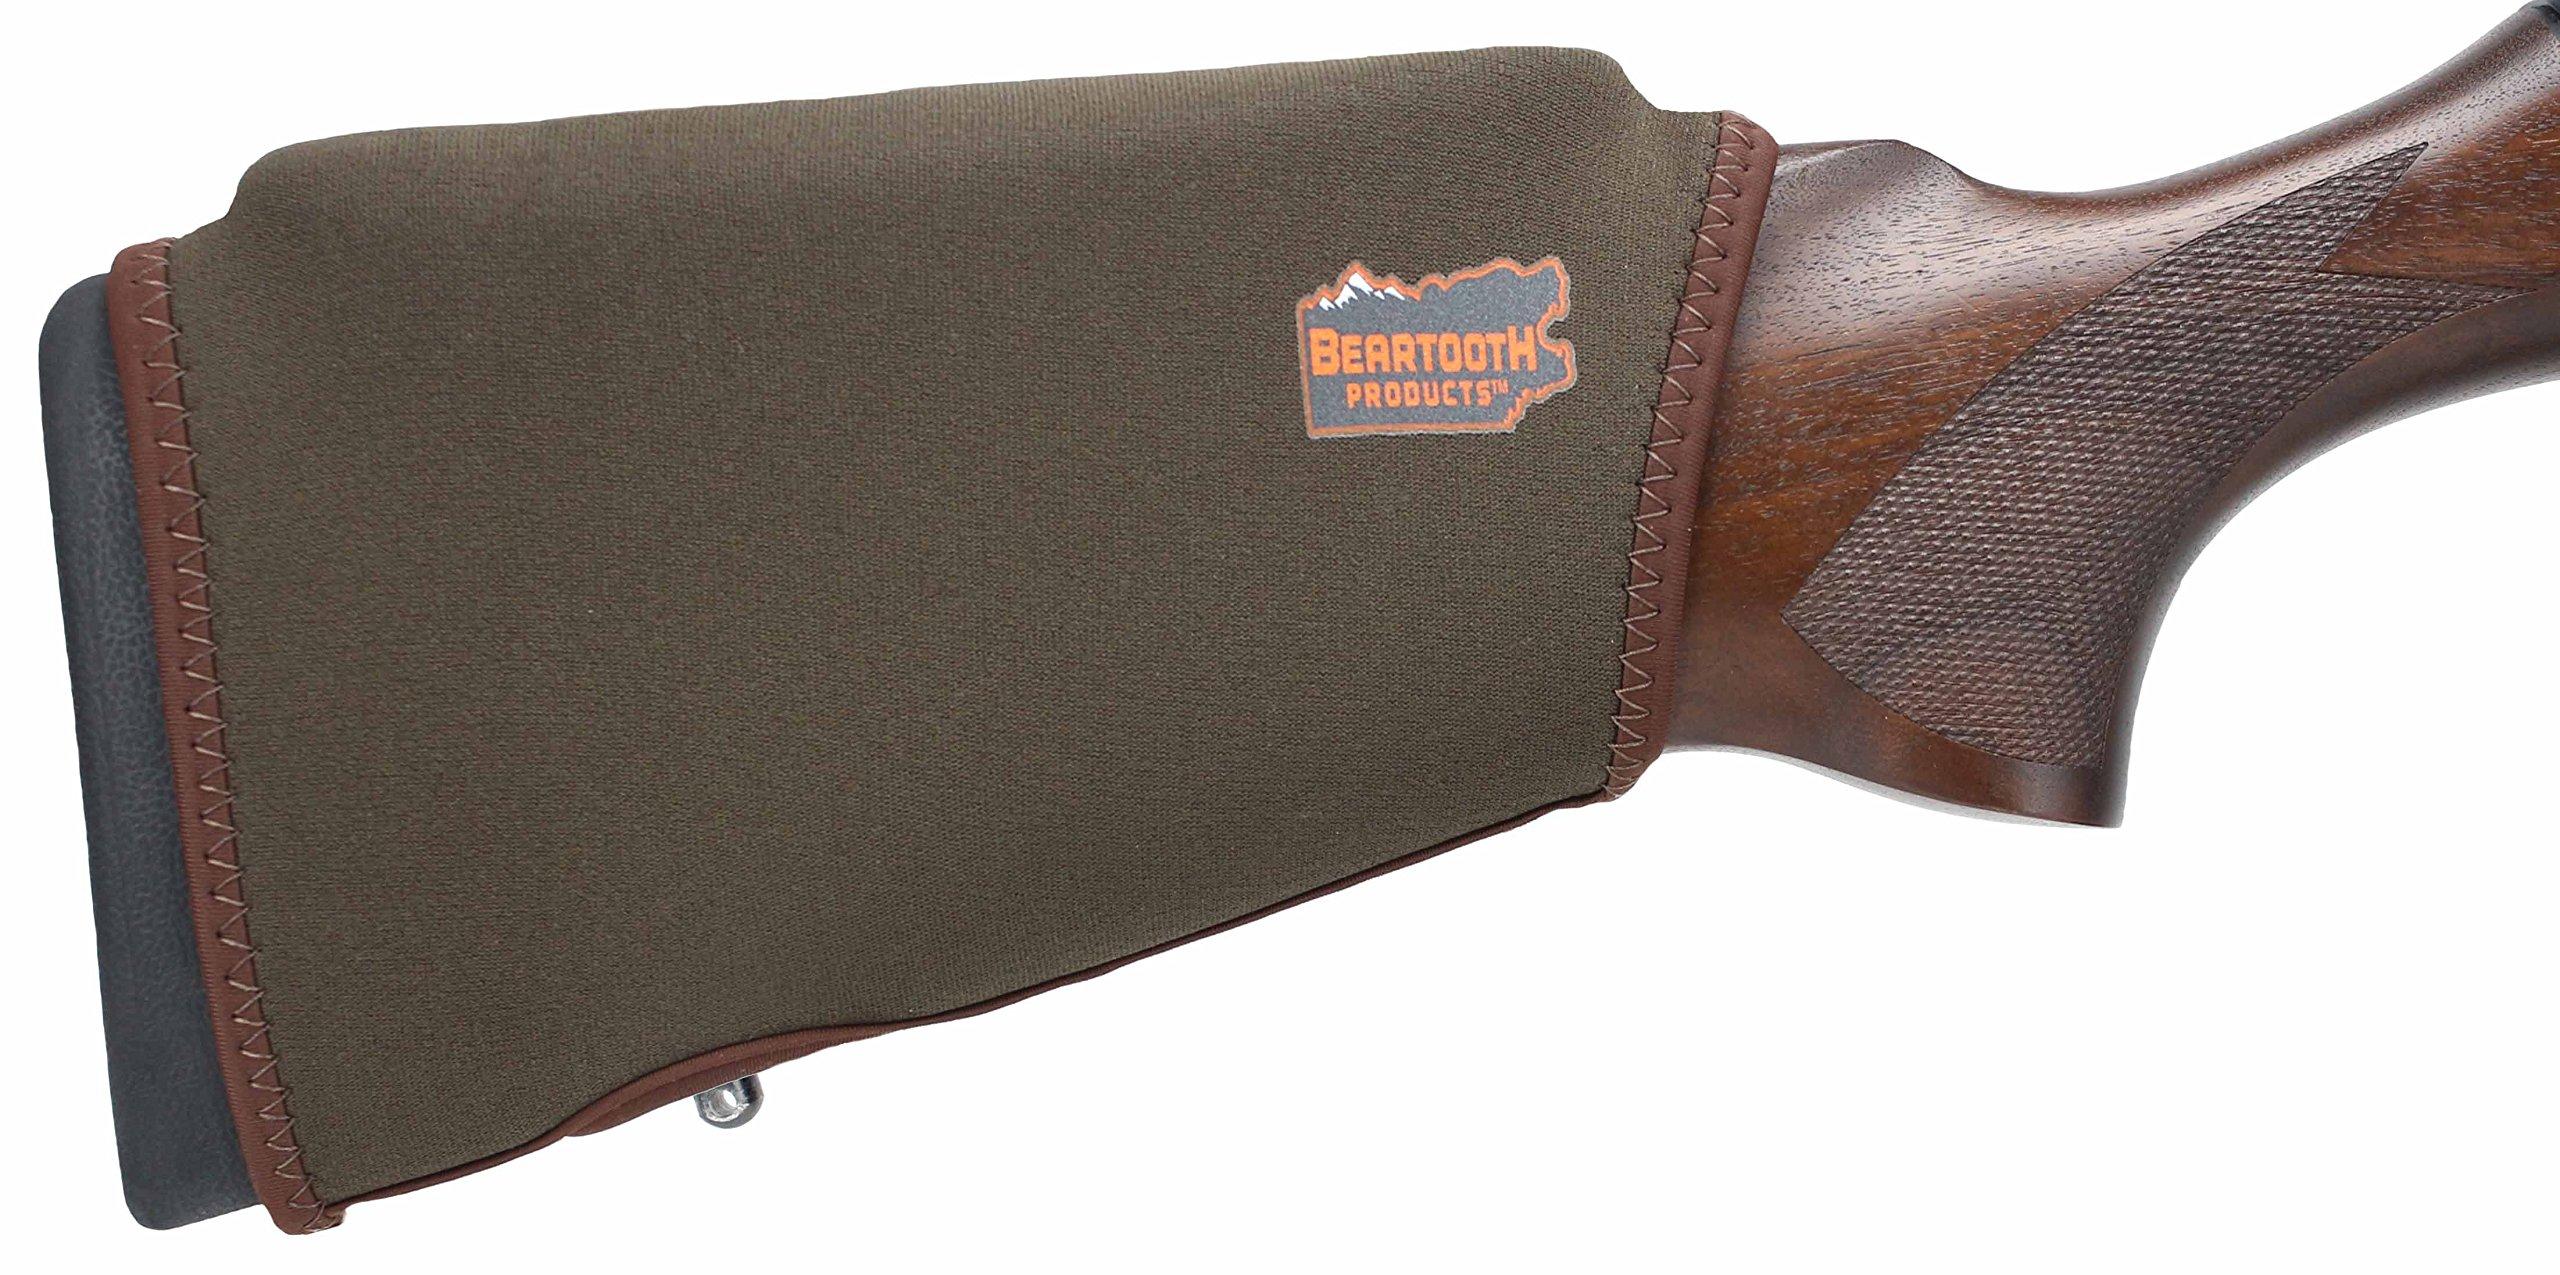 Beartooth Comb Raising Kit 2.0 - Premium Neoprene Gun Stock Cover + (5) Hi-Density Foam Inserts - NO Loops Model (Brown) by Beartooth Products